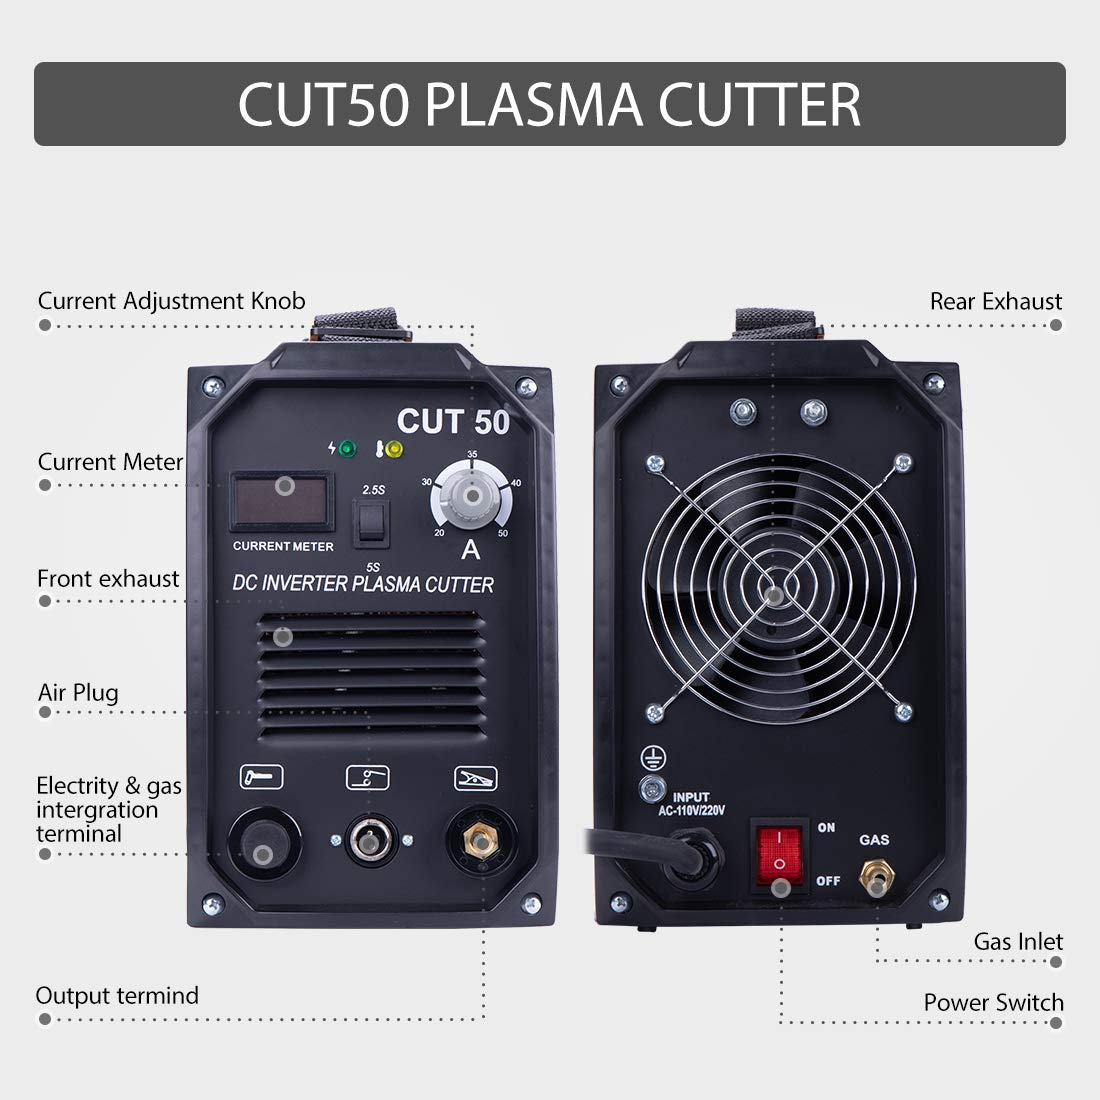 VIVOHOME DC Inverter Plasma Cutter Cutting Machine Dual Voltage 110V/220V CUT-50 by VIVOHOME (Image #1)